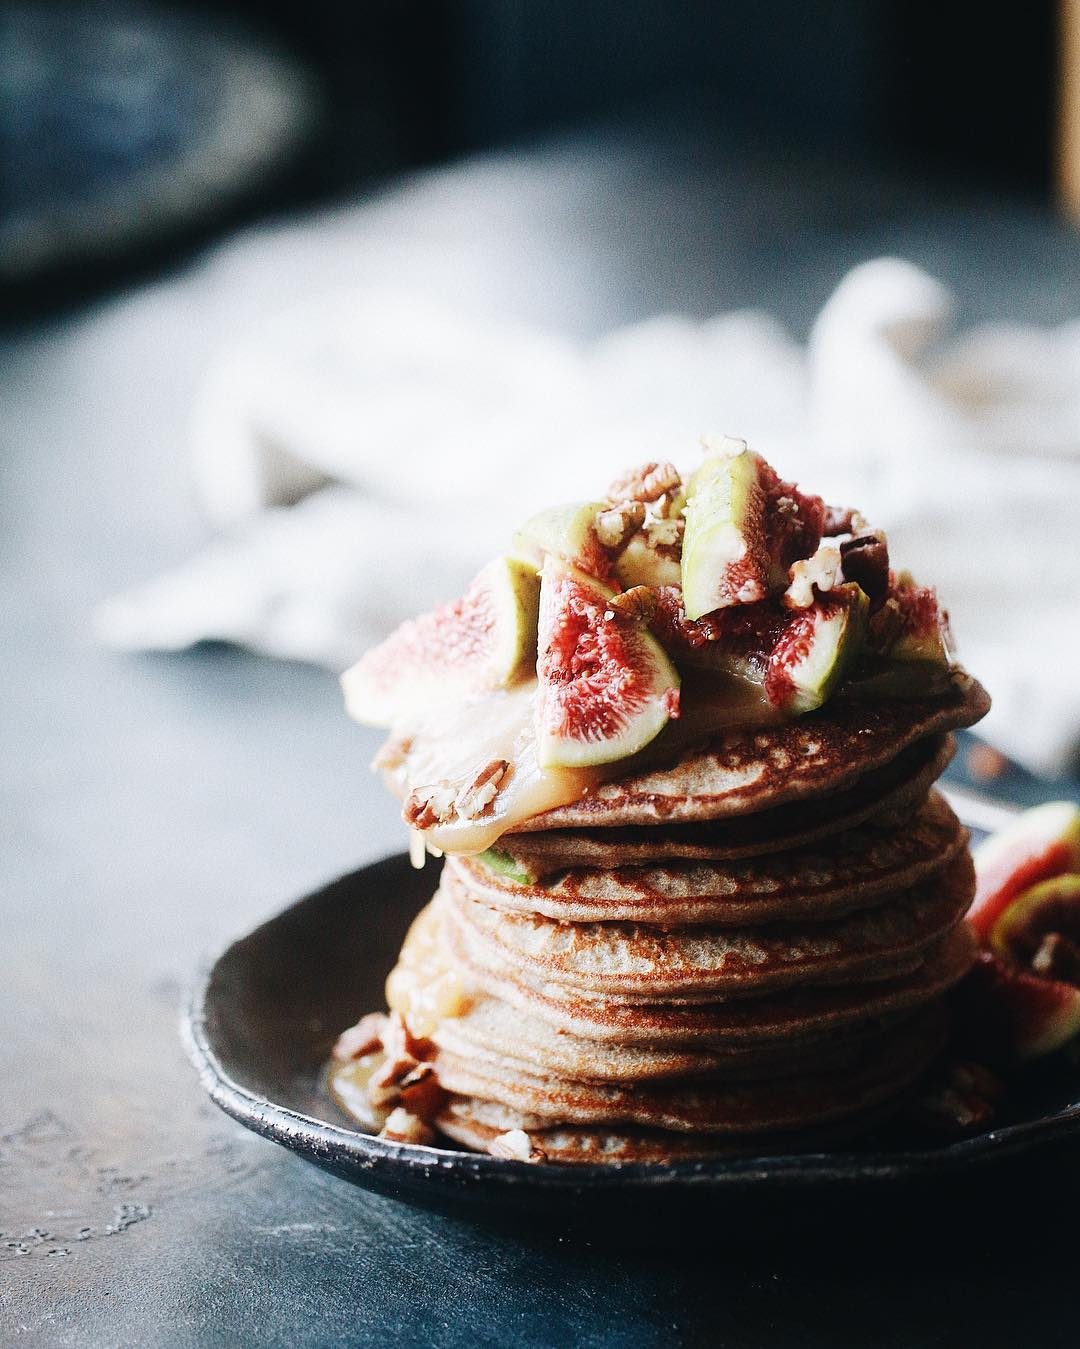 Instagram food photographers